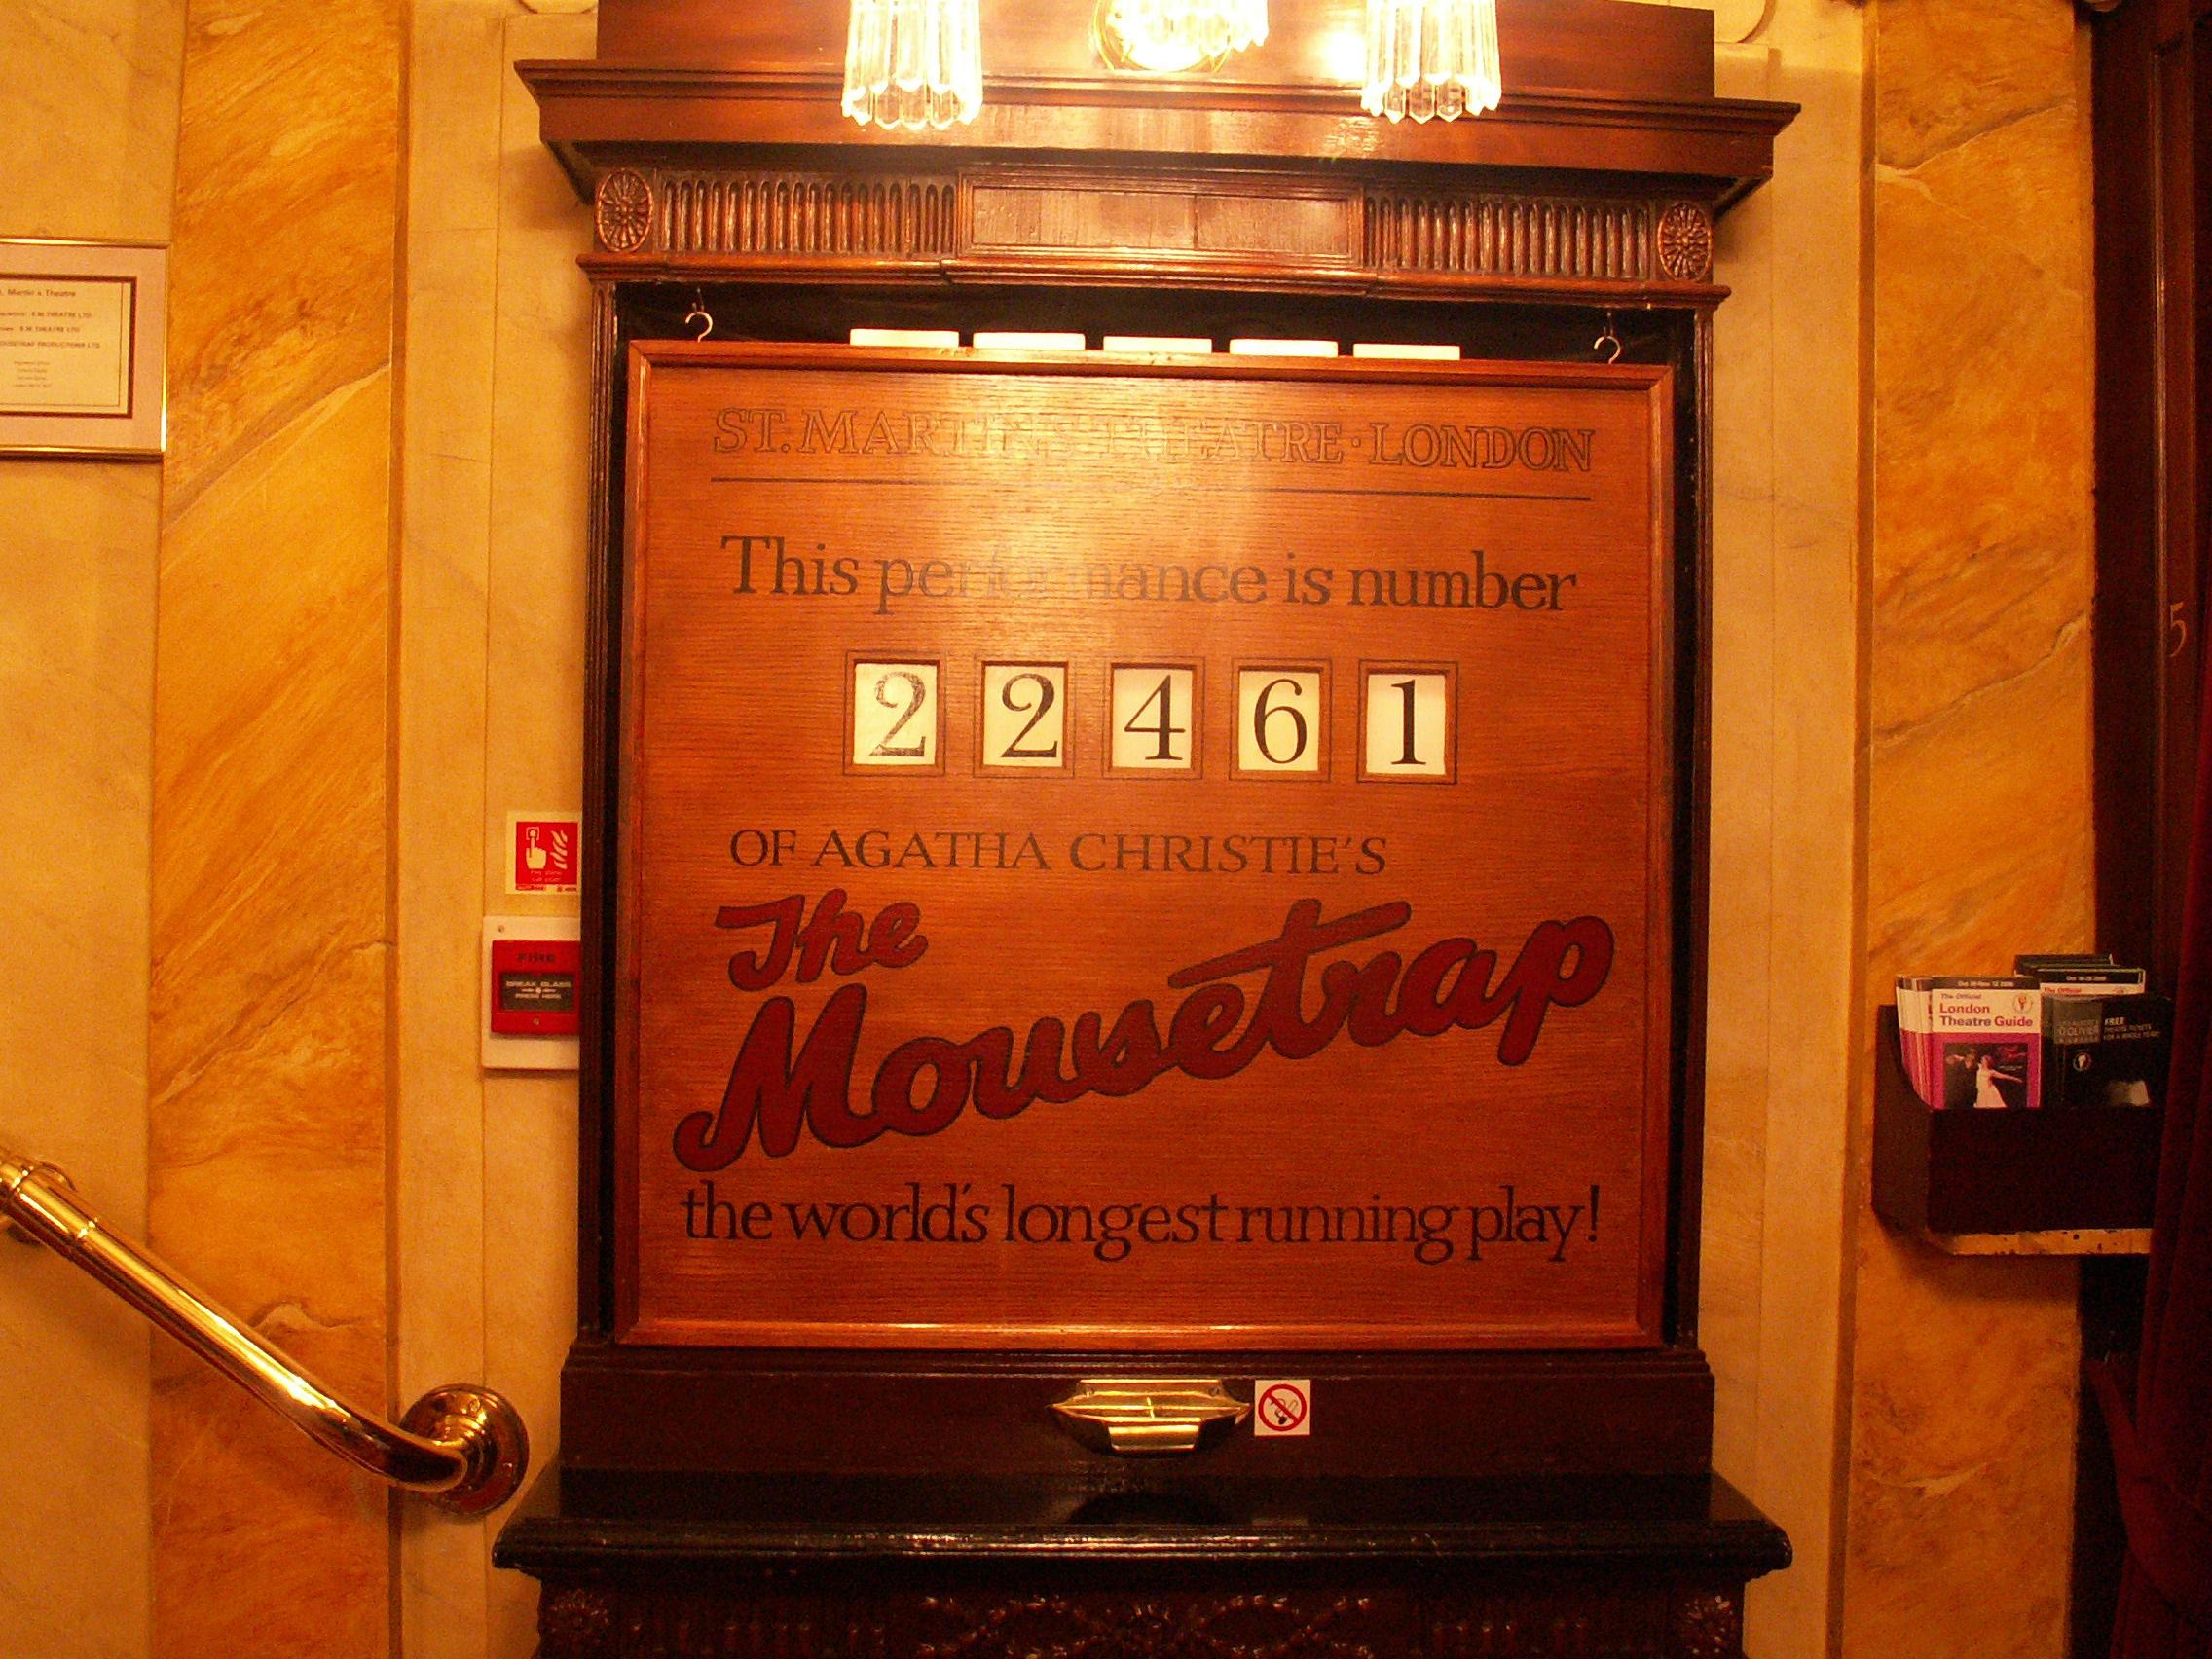 Mousetrap 22461.JPG